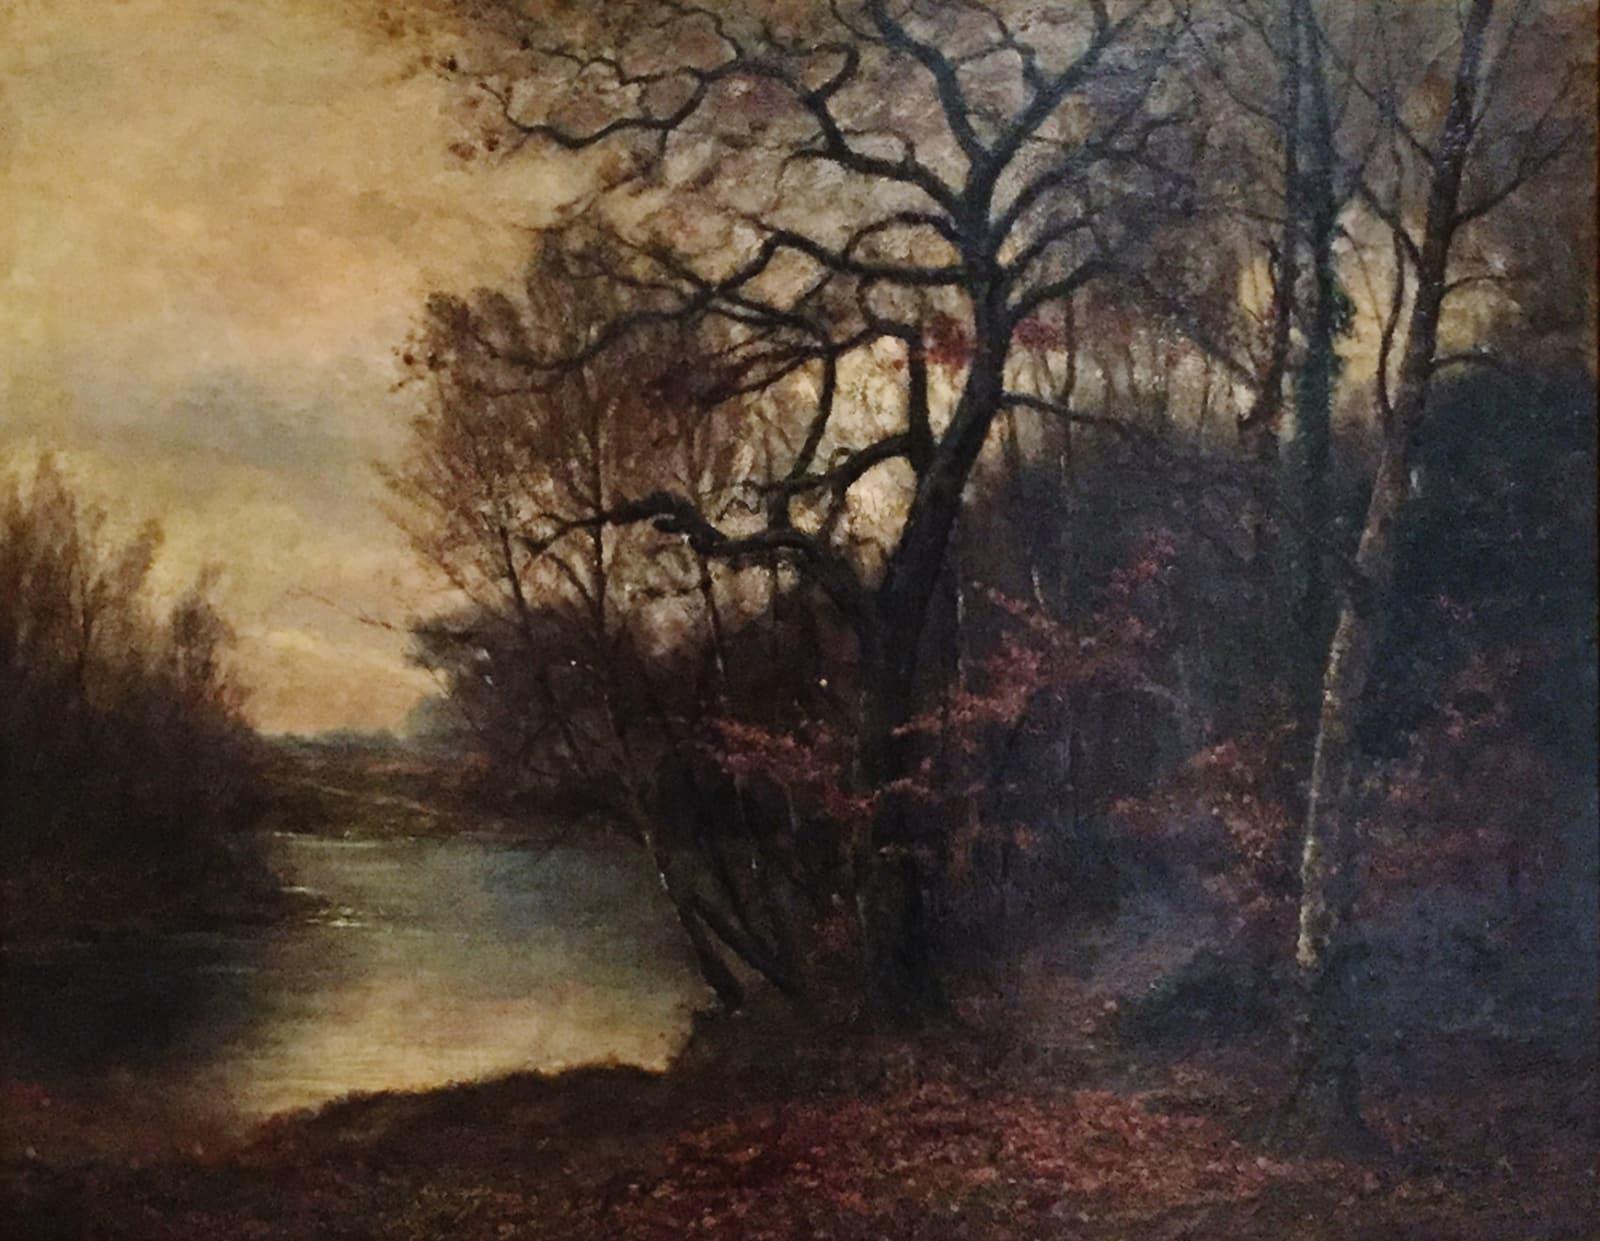 Charles Ethan Porter, Forest, c.1879